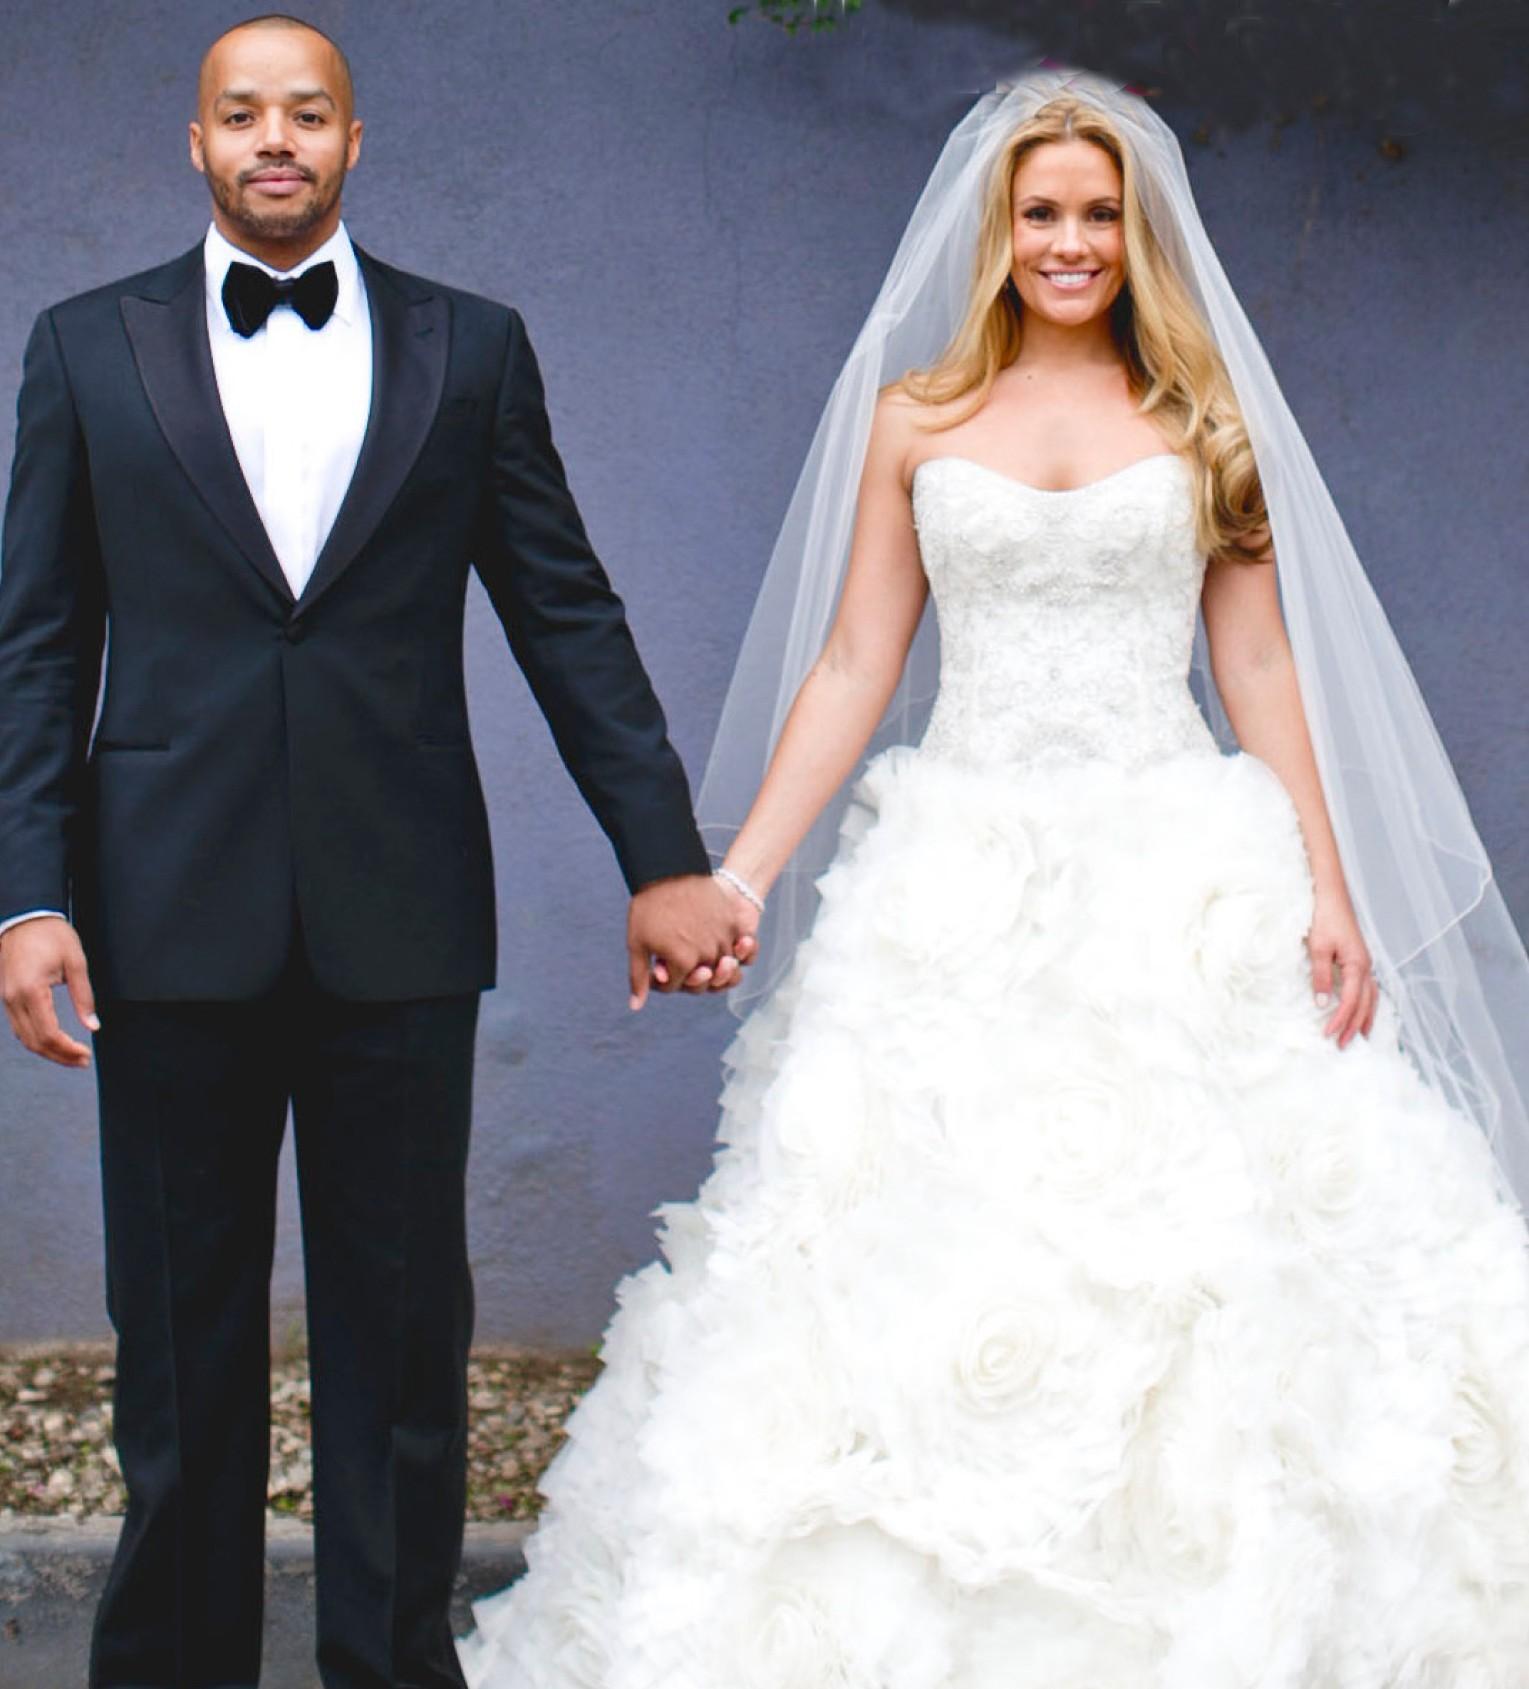 Gallery of celebrity wedding dresses